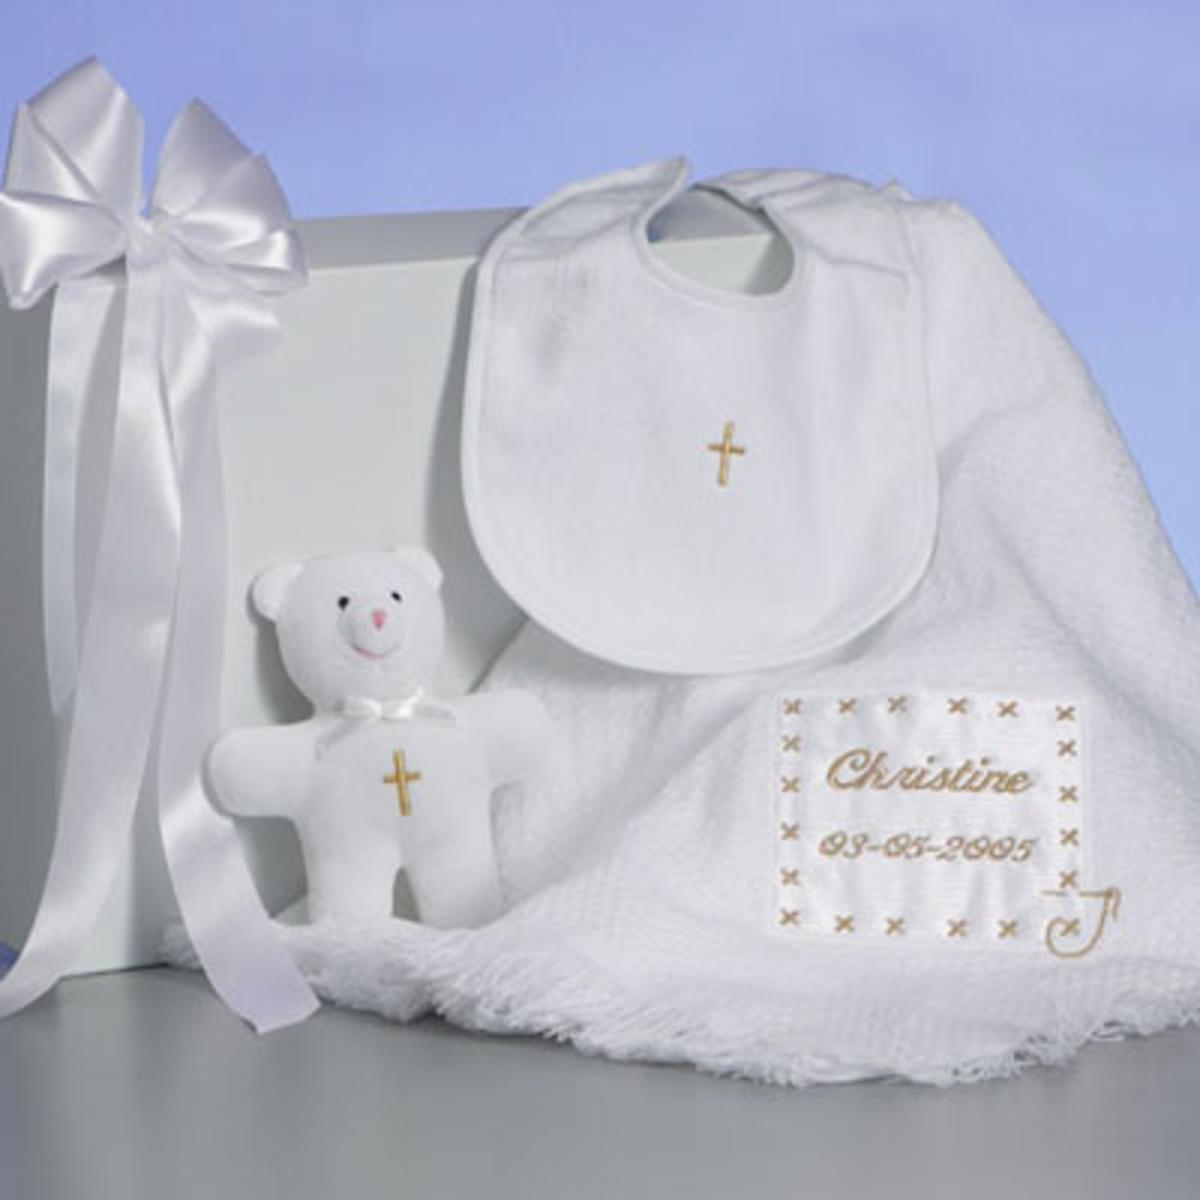 Unique Christening Gift Ideas